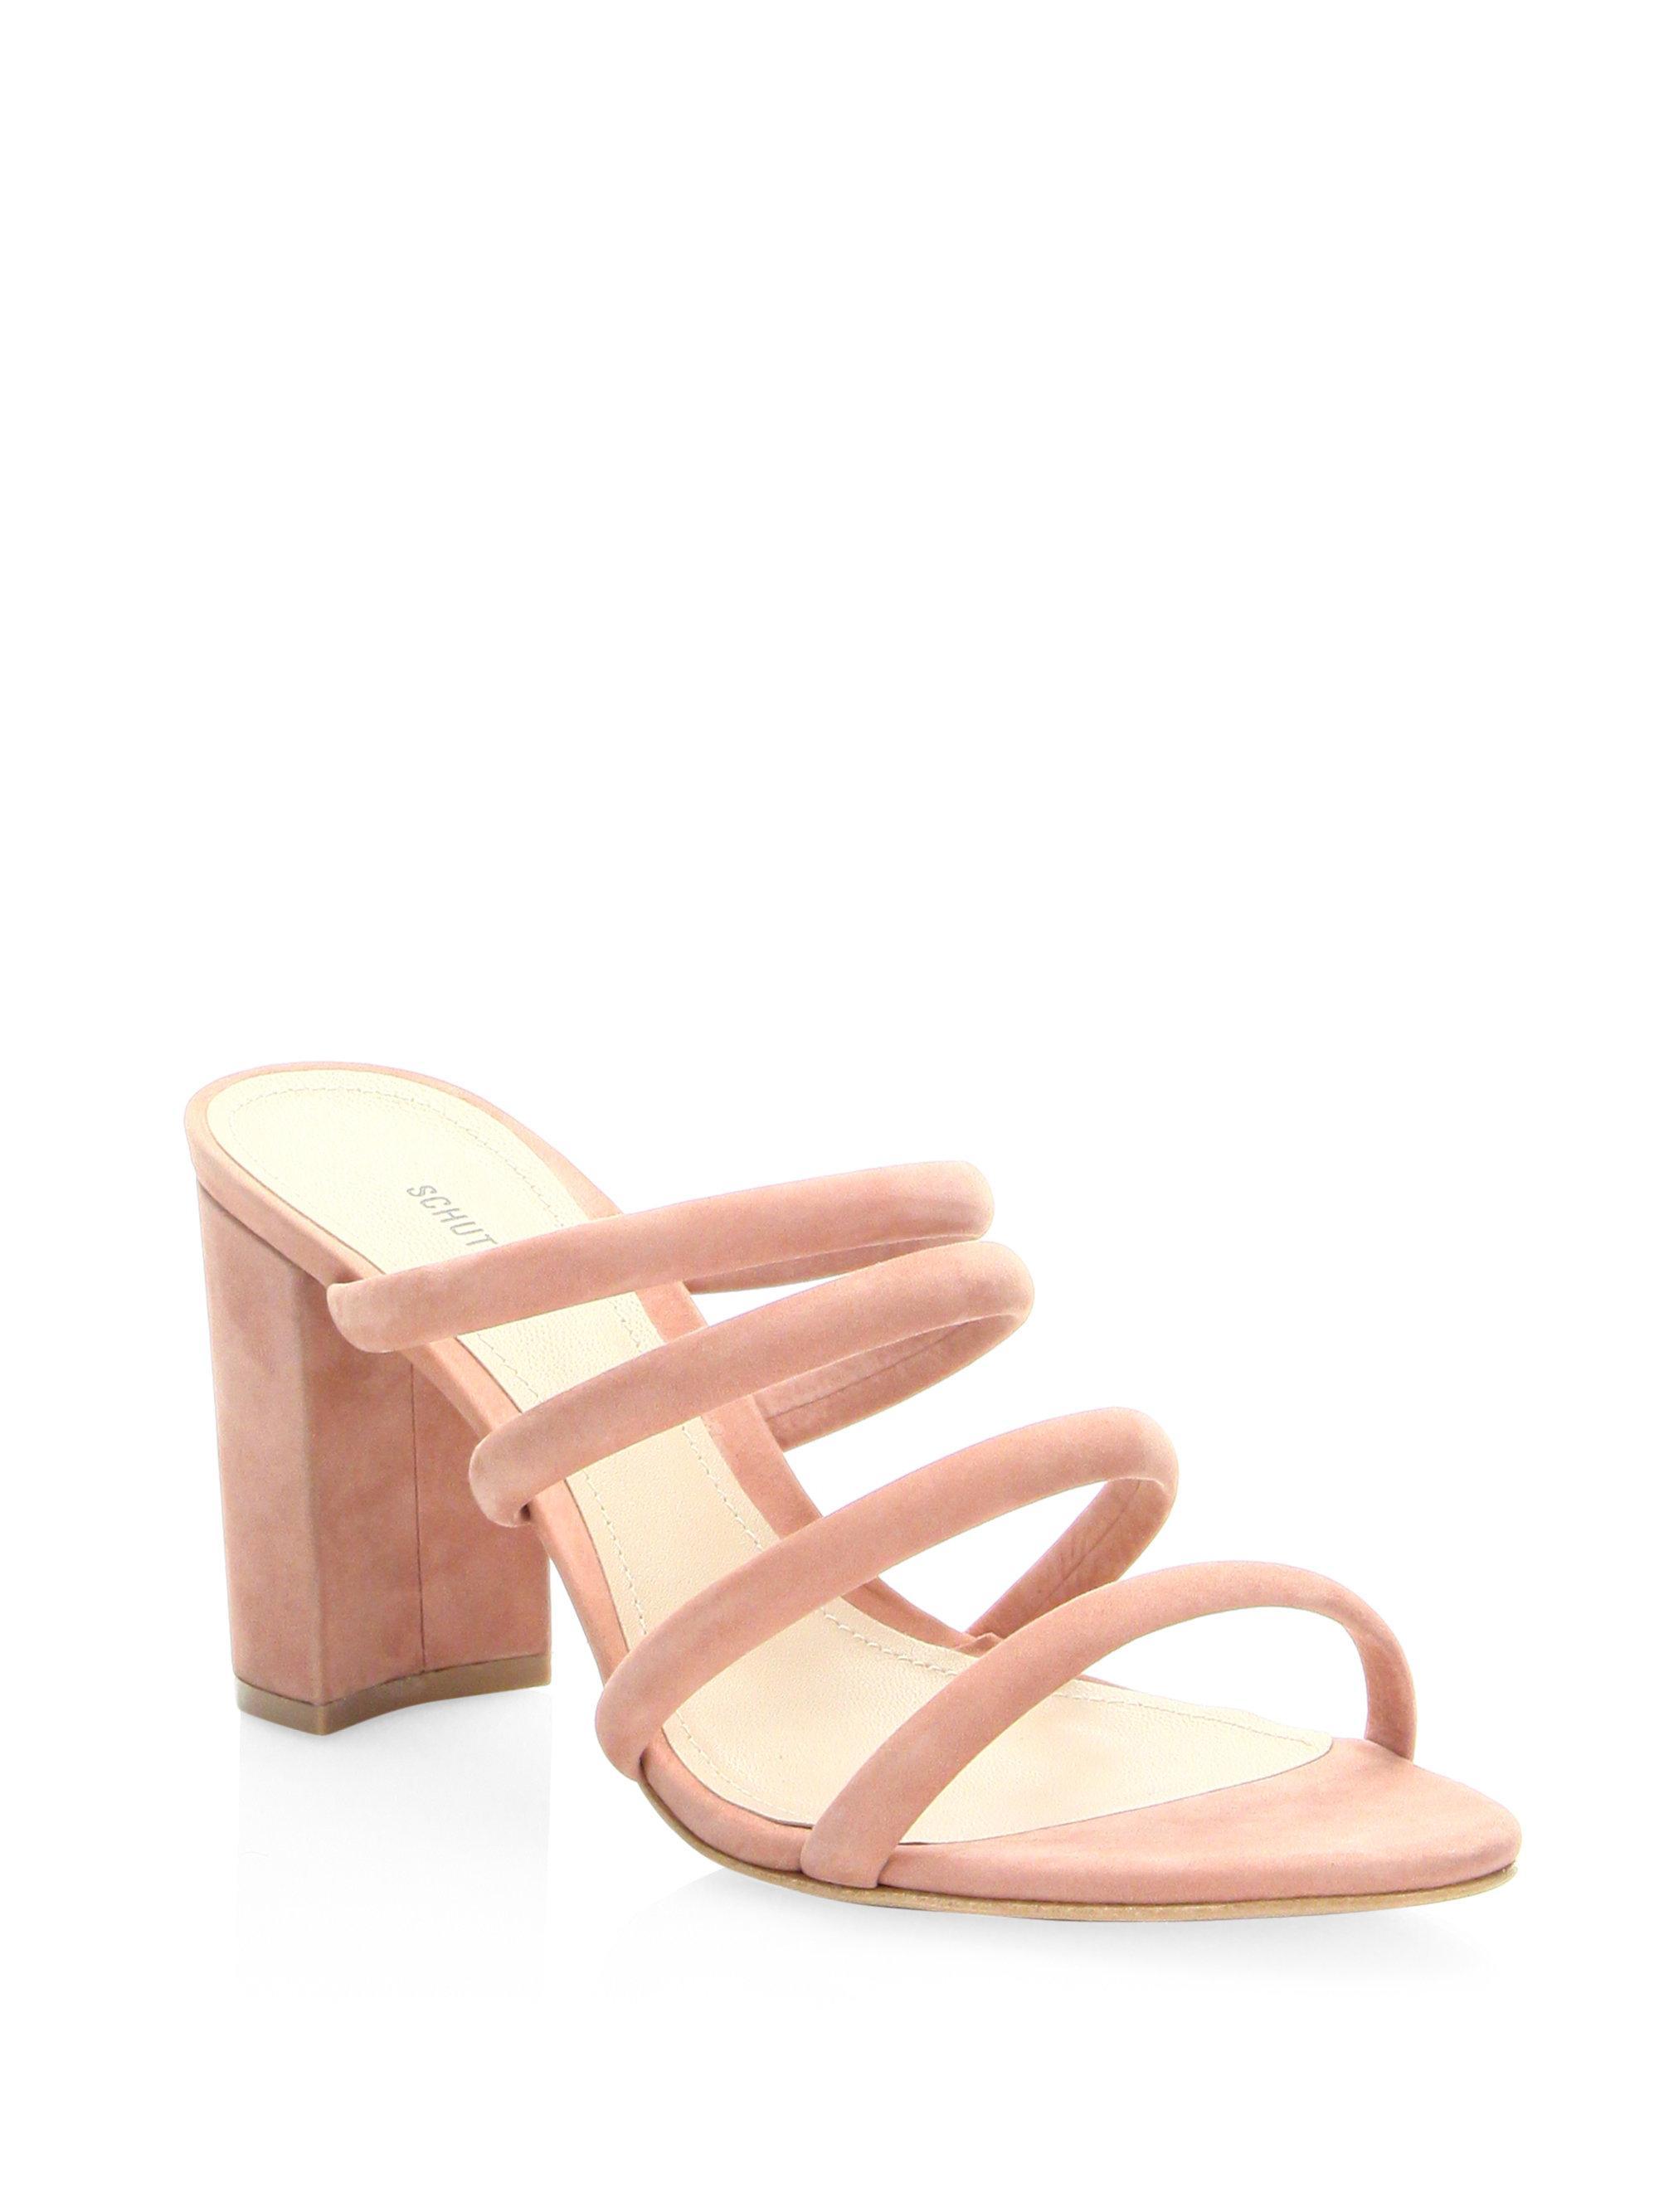 cf2438127804 Schutz Women s Felisa Suede Sandals - Poppy Rose - Size 6 - Lyst